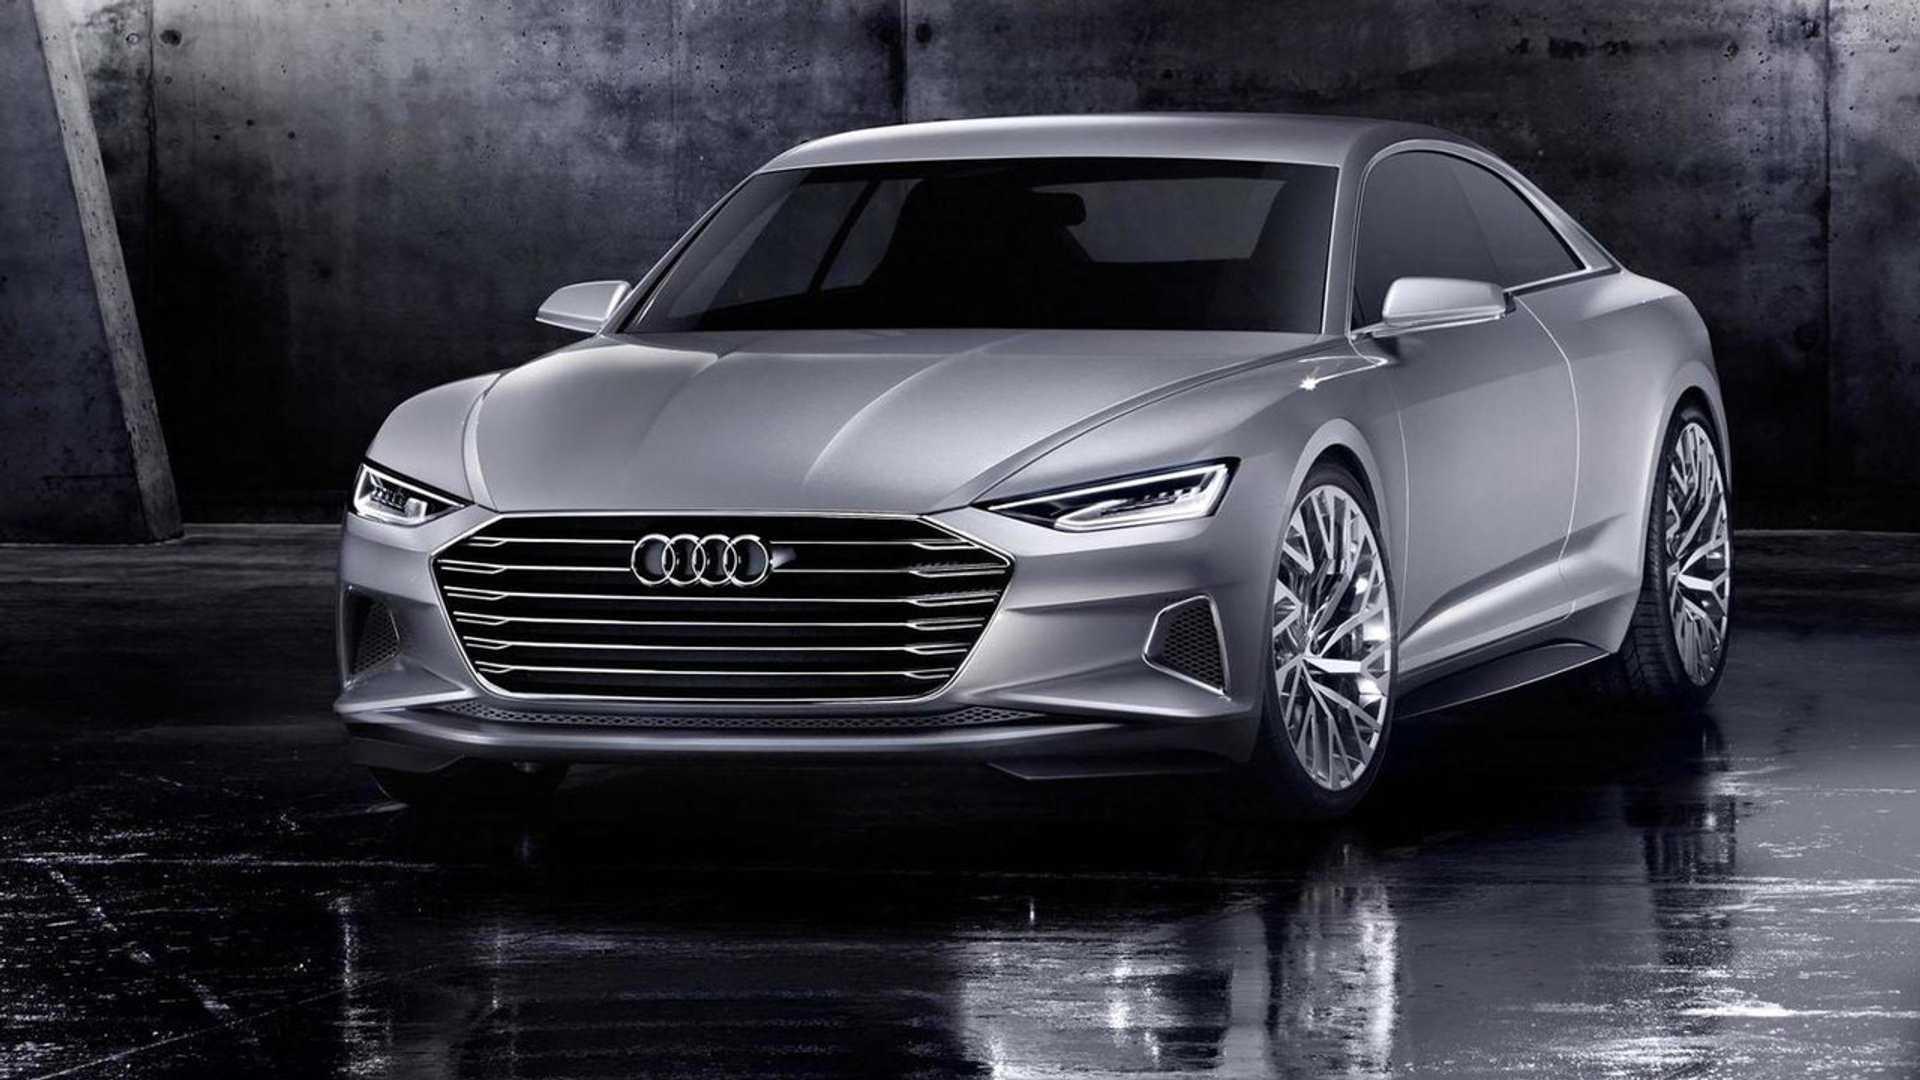 Kelebihan Audi A9 Tangguh